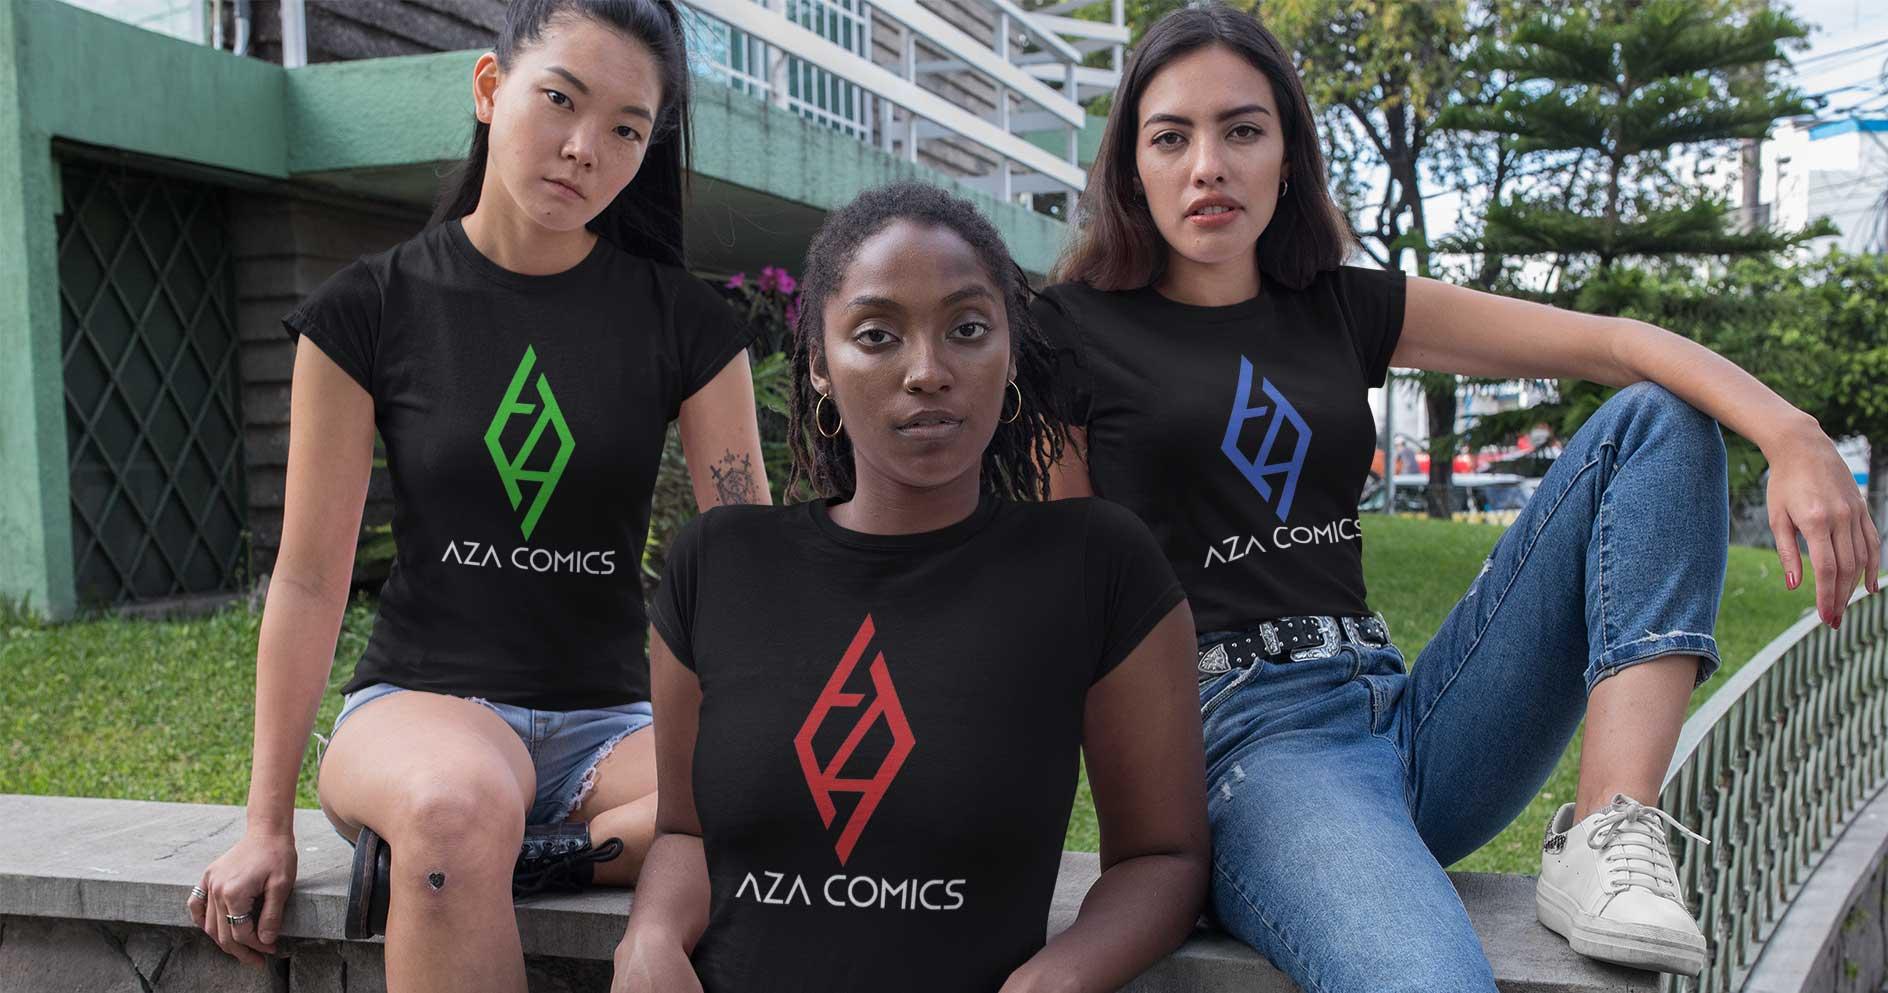 mockup-of-three-women-wearing-t-shirts-outside-32051-crop